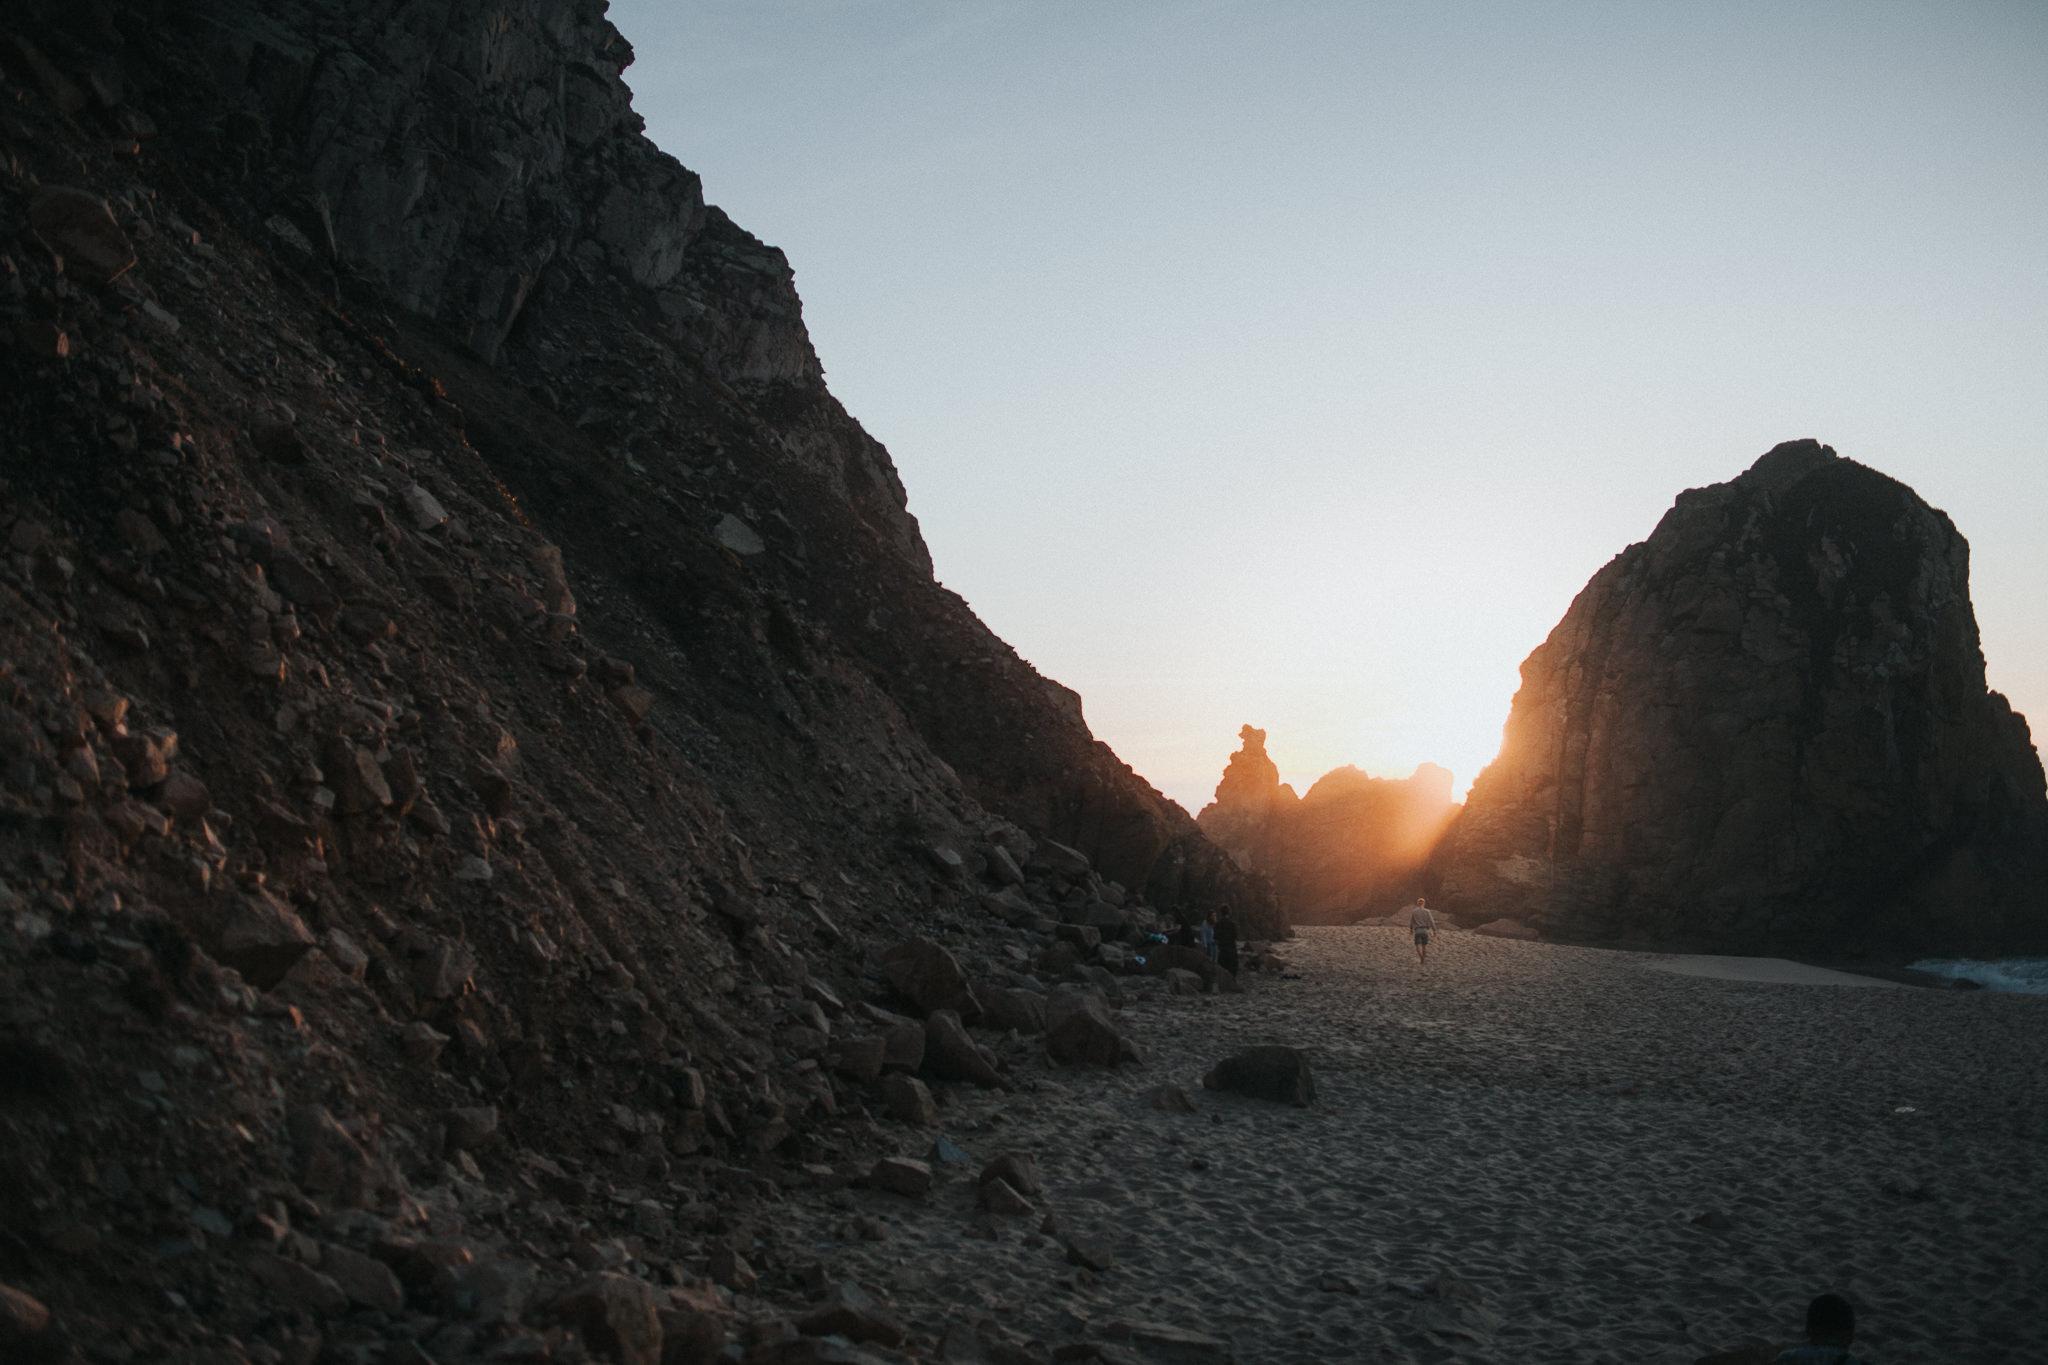 rays of sun between rocks